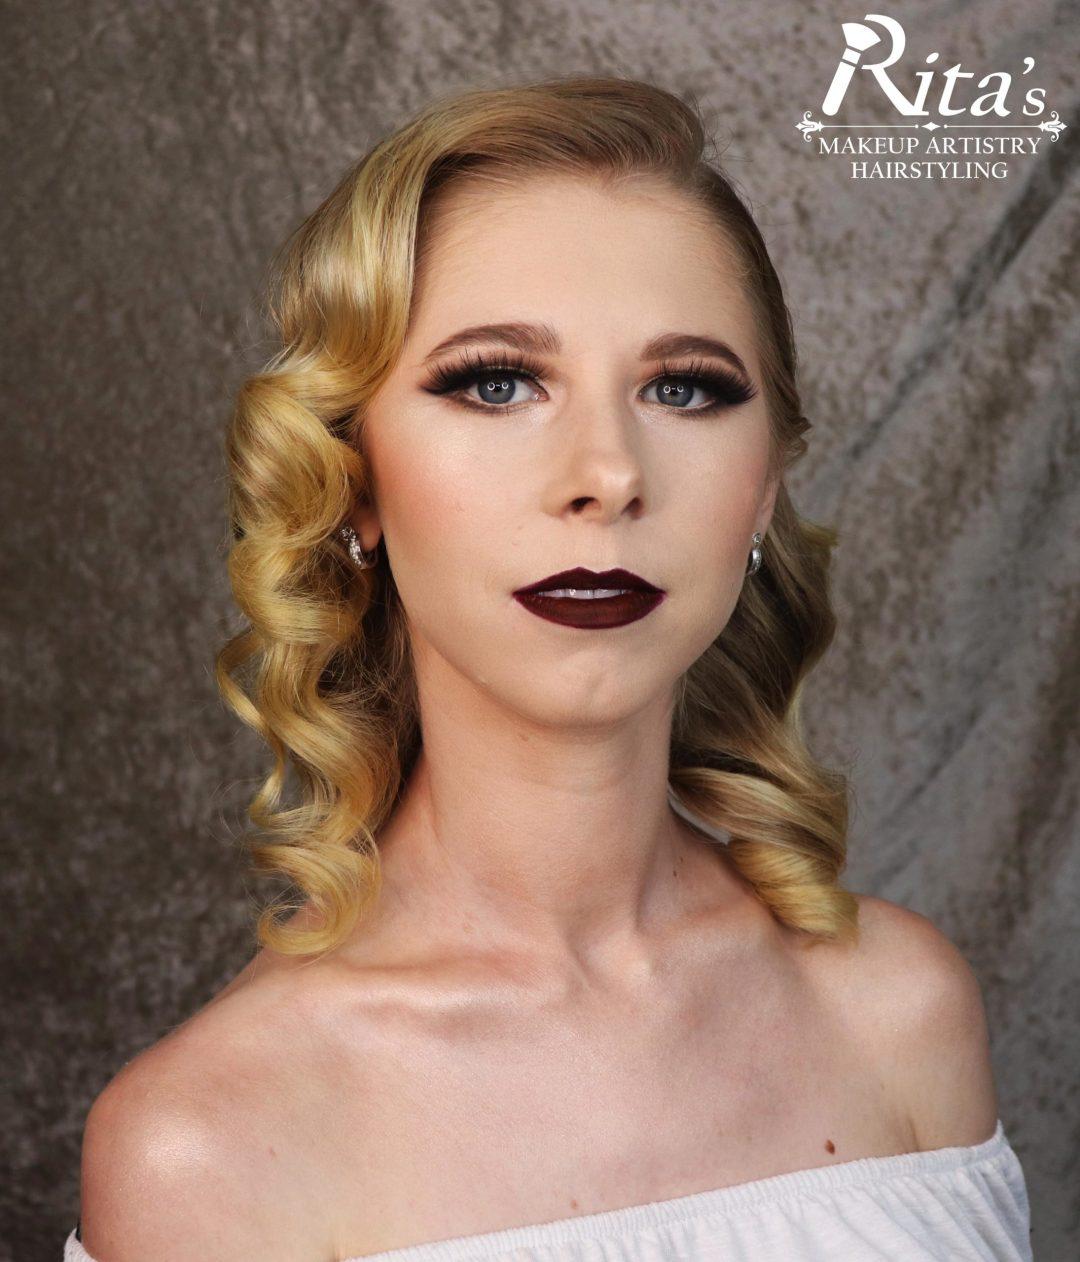 Billie Erin Model with Rita's Makeup Artistry